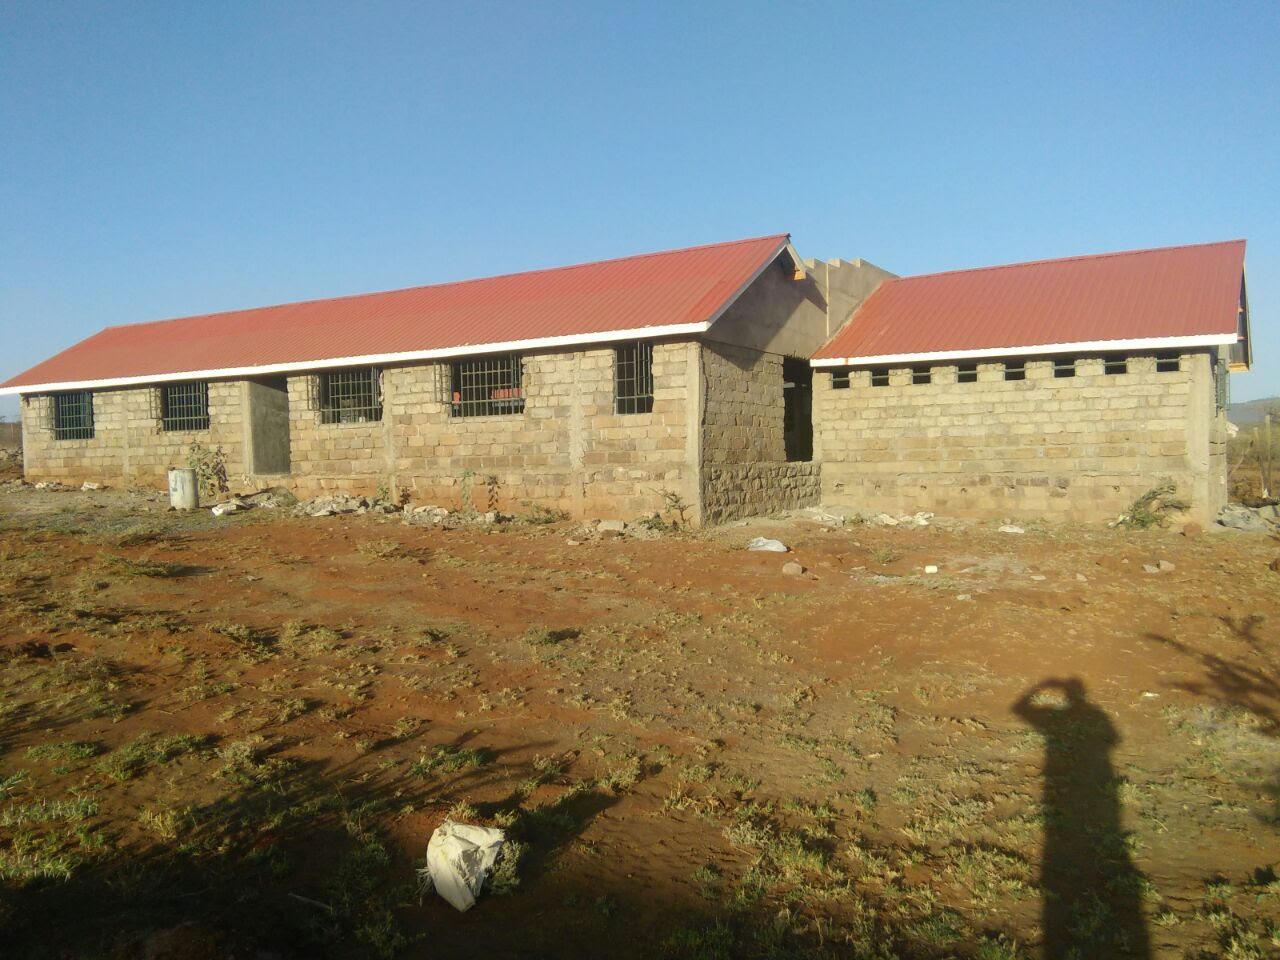 Location 1: Outreaches and Halfway House - Kawangaware Slum (Nairobi)